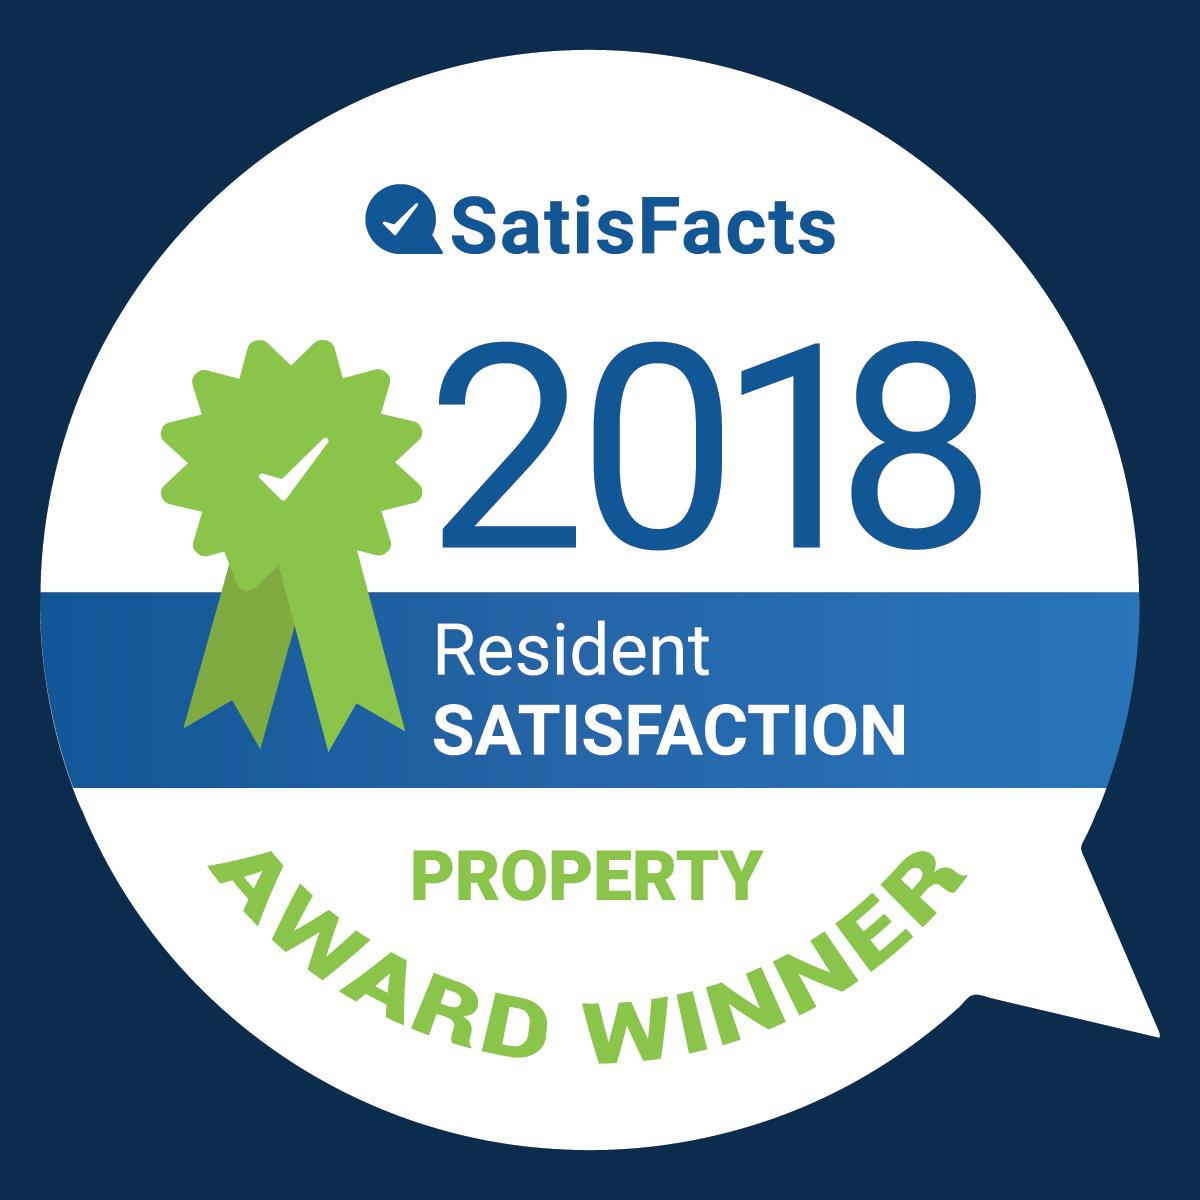 2018 SatisFacts Resident Satisfaction Property Award Winner